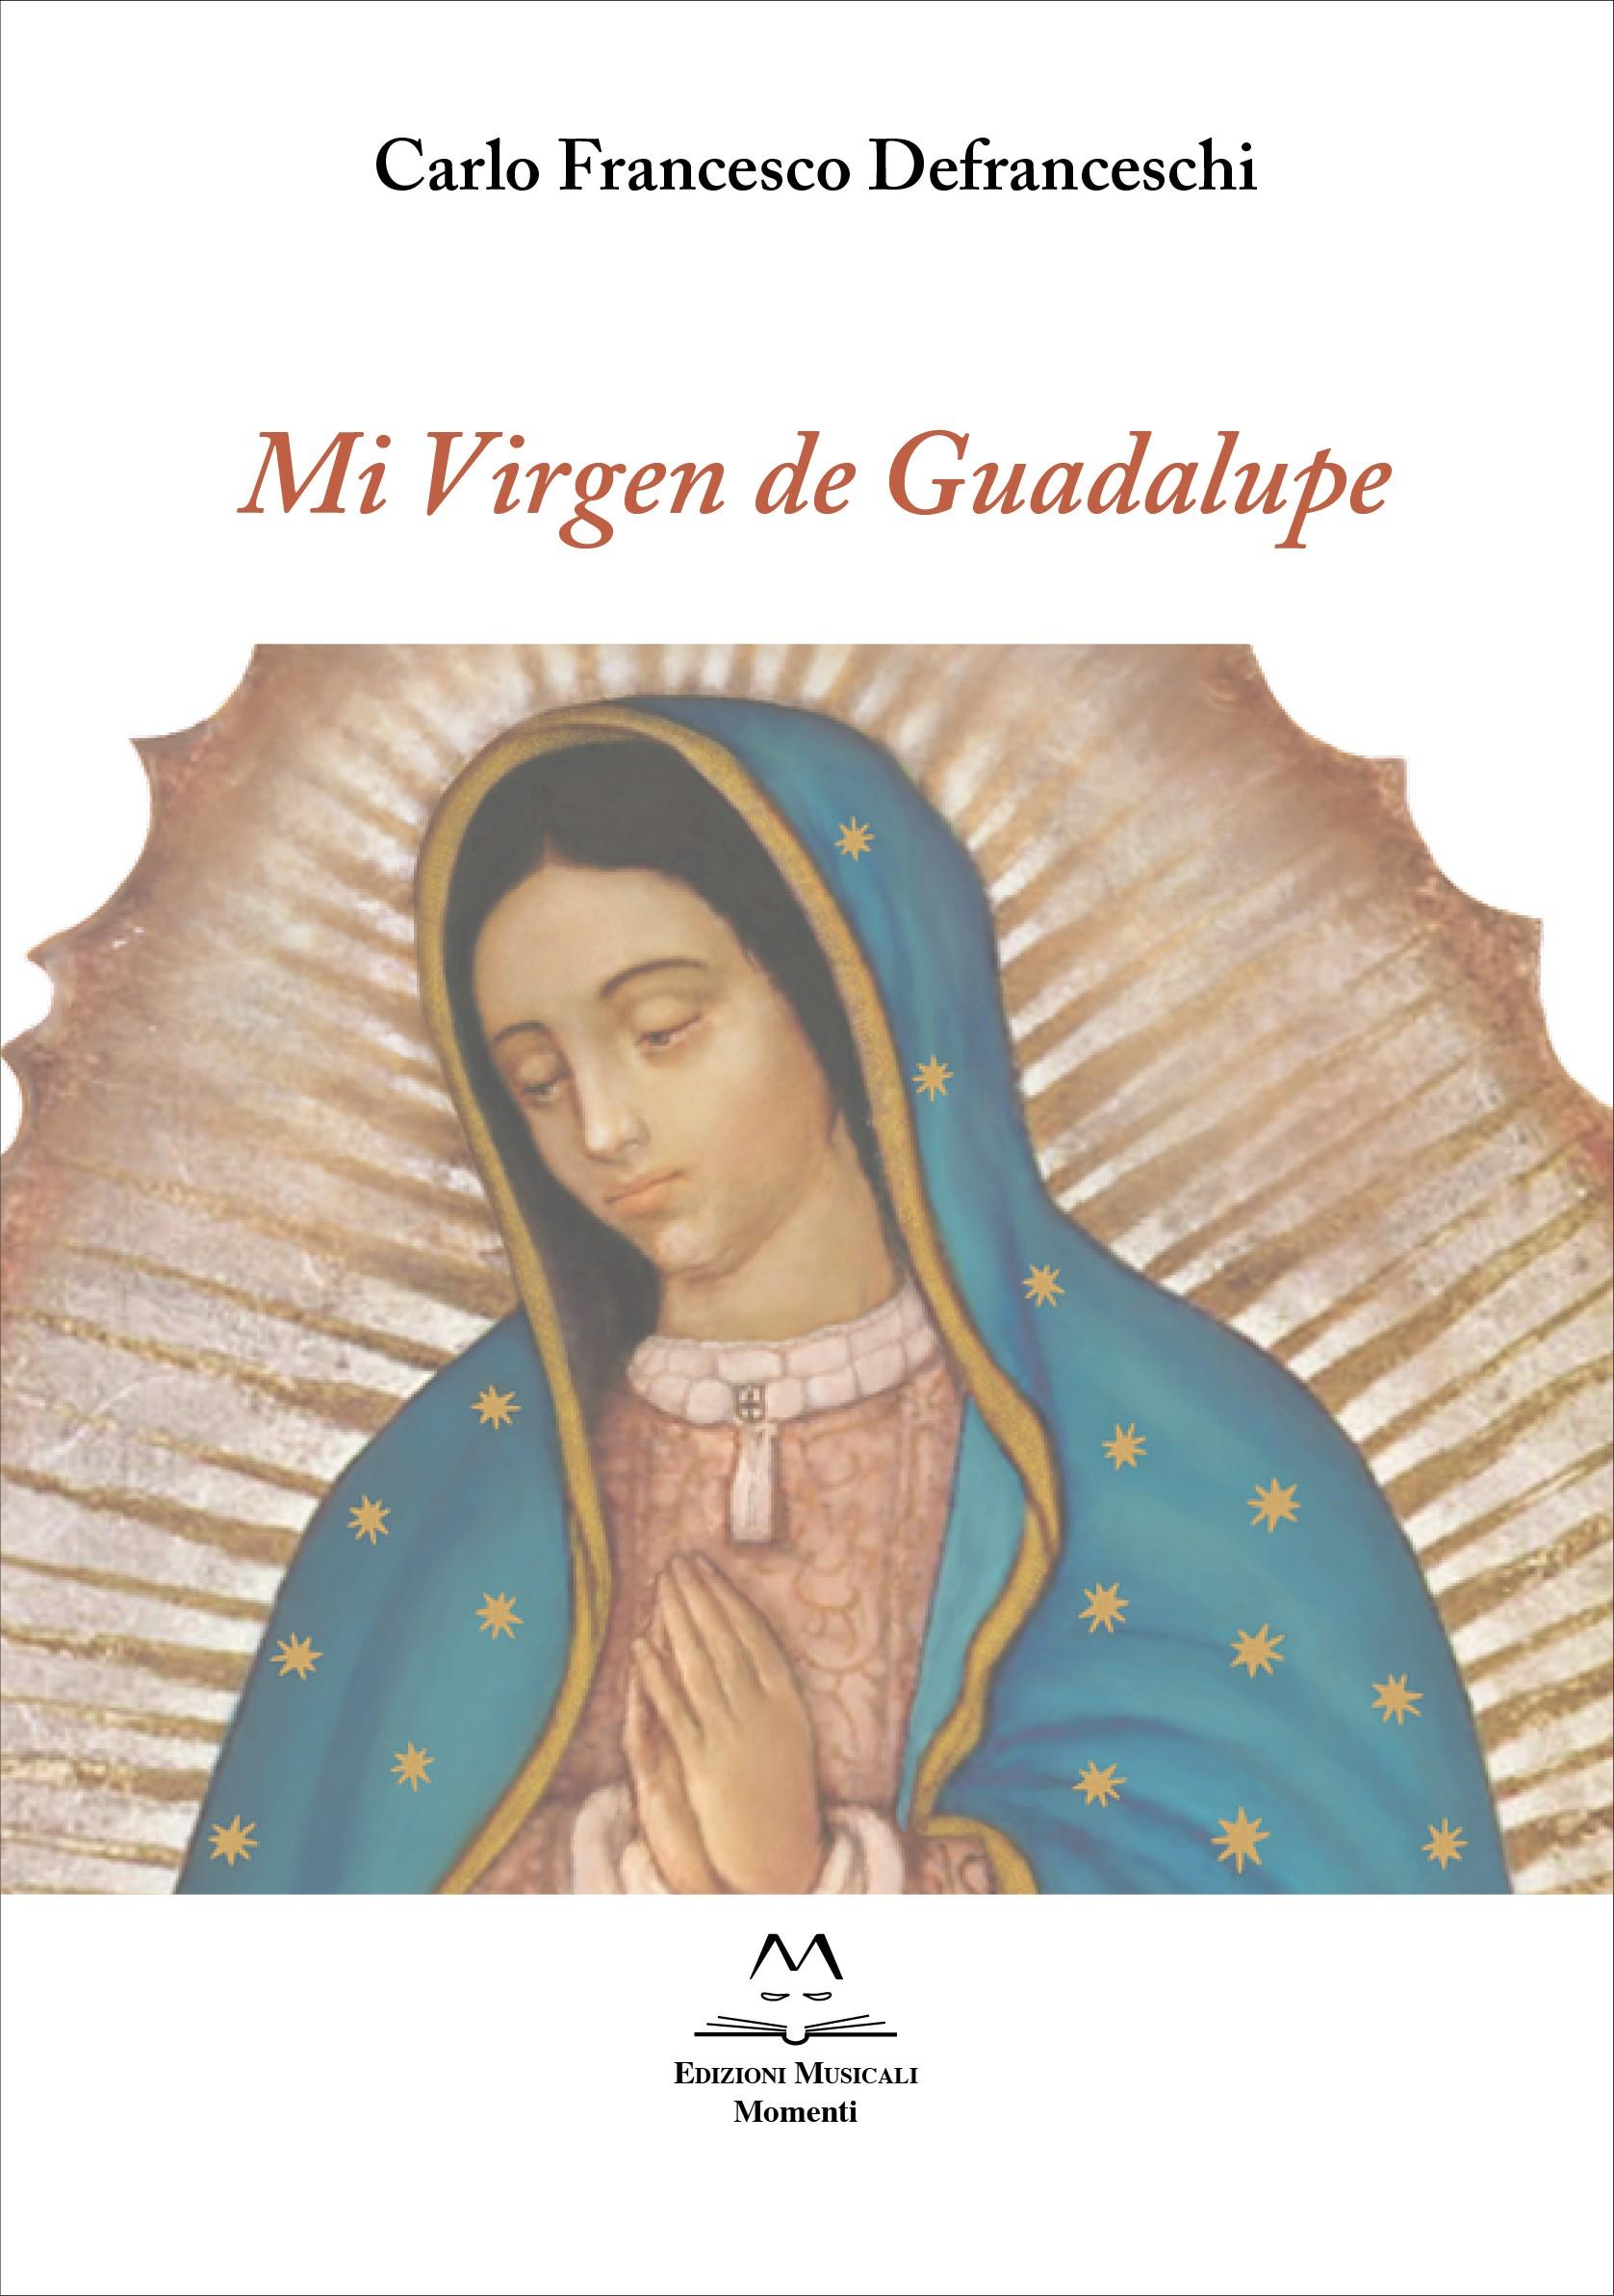 Mi Virgen de Guadalupe cartaceo